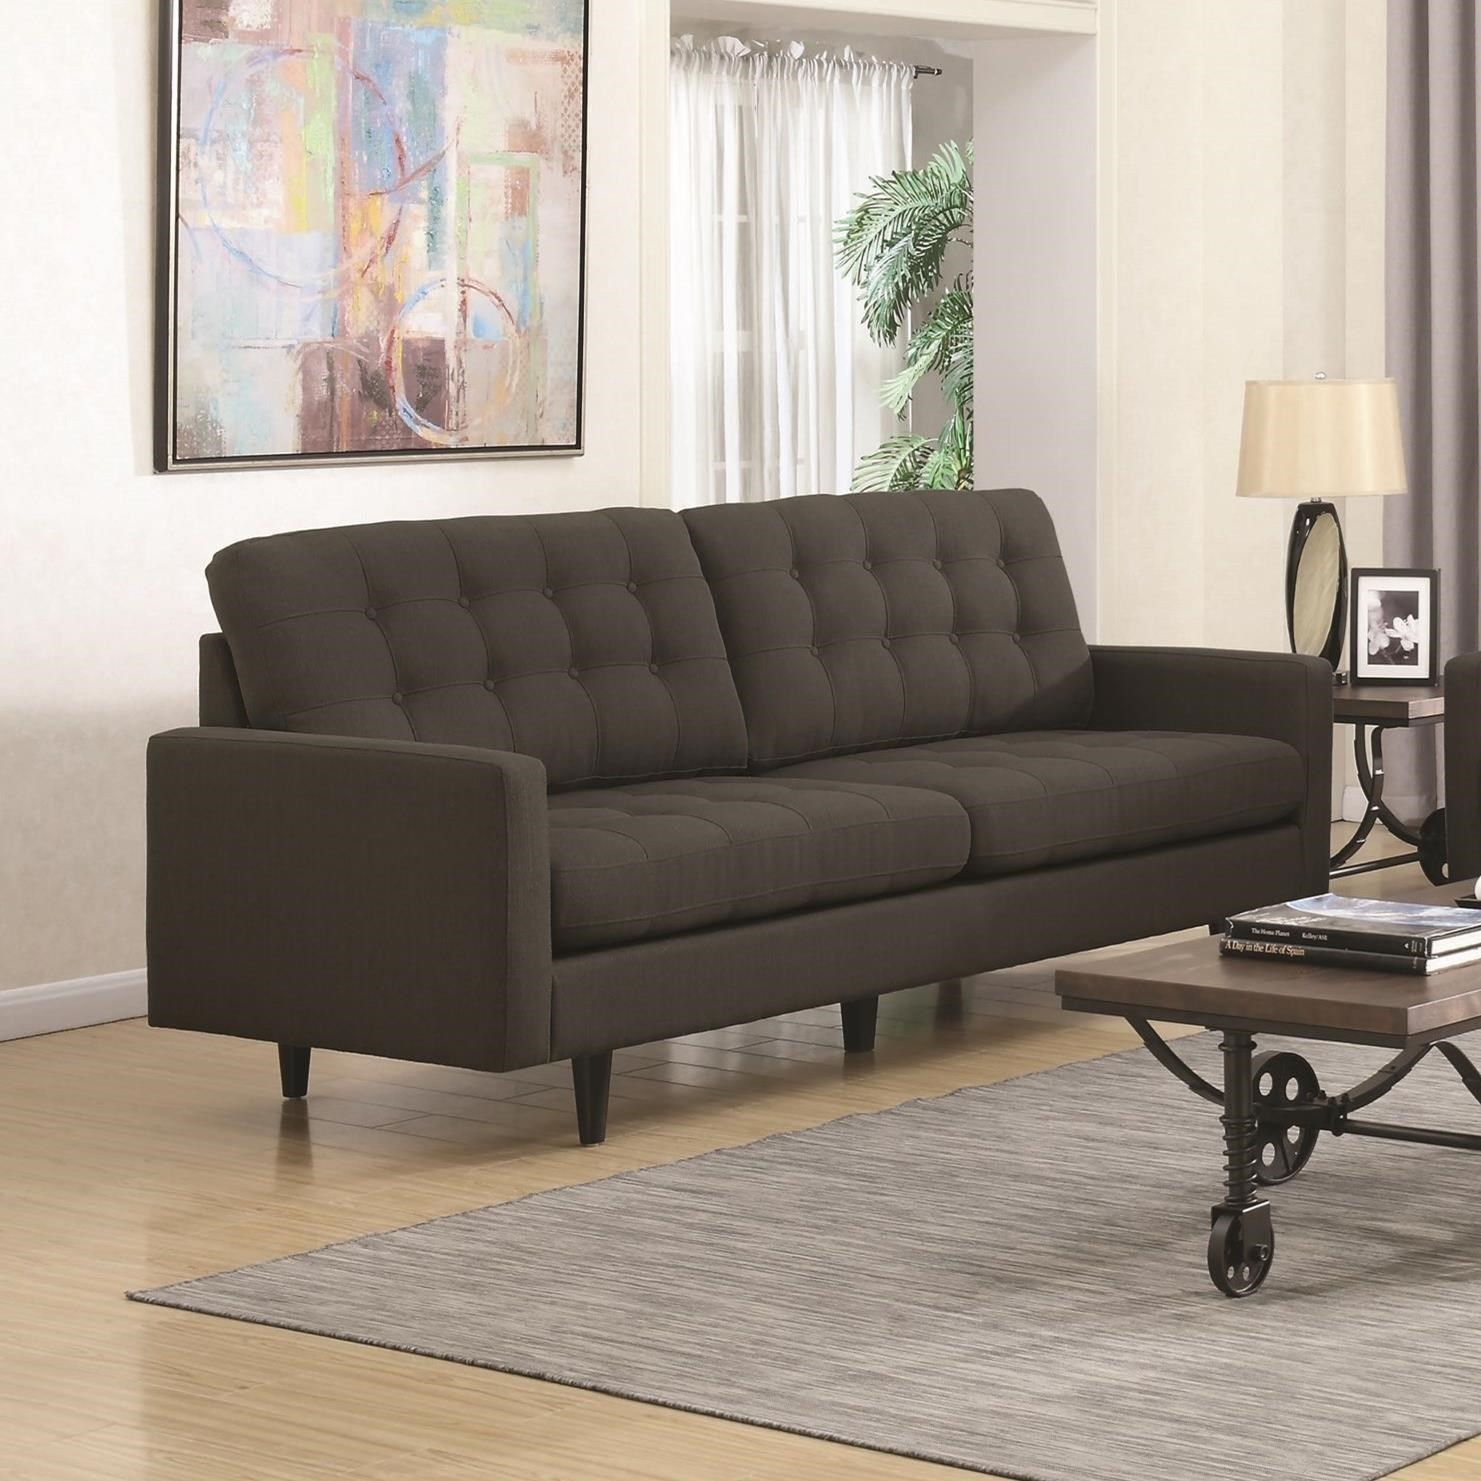 Coaster Kesson Sofa - Item Number: 505374